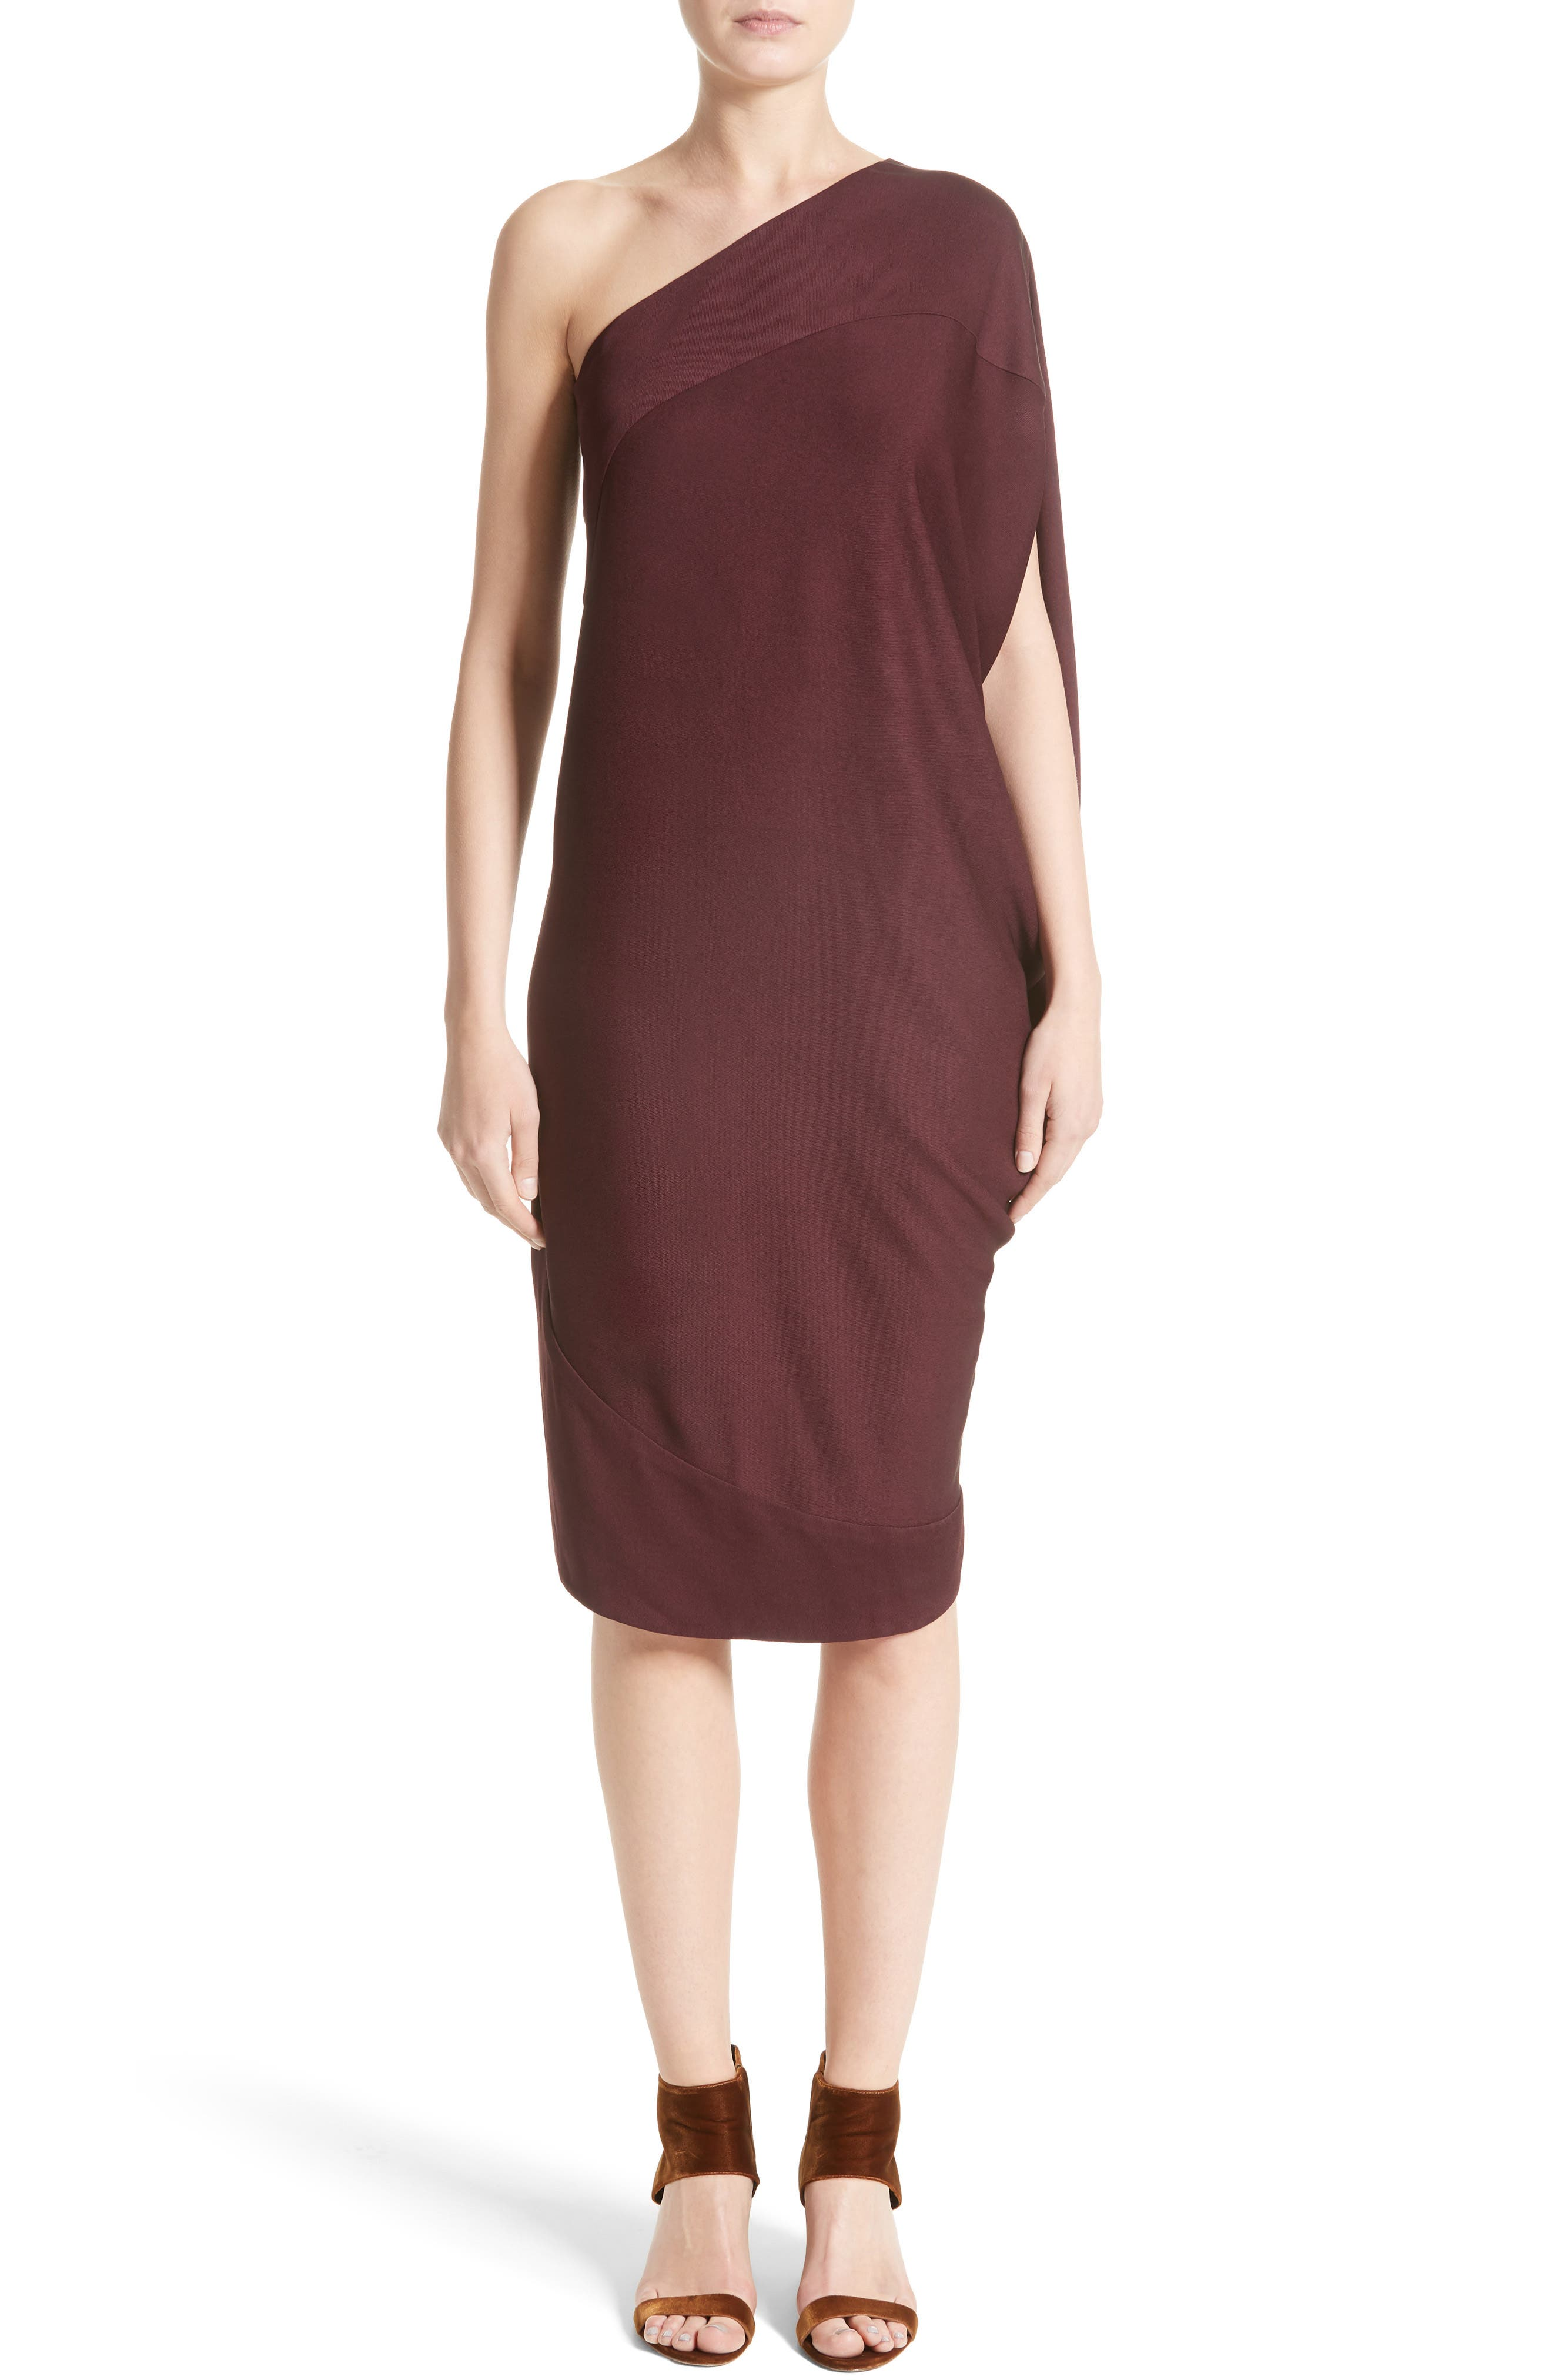 Zero + Maria Cornejo Lui Eco Drape One-Shoulder Dress